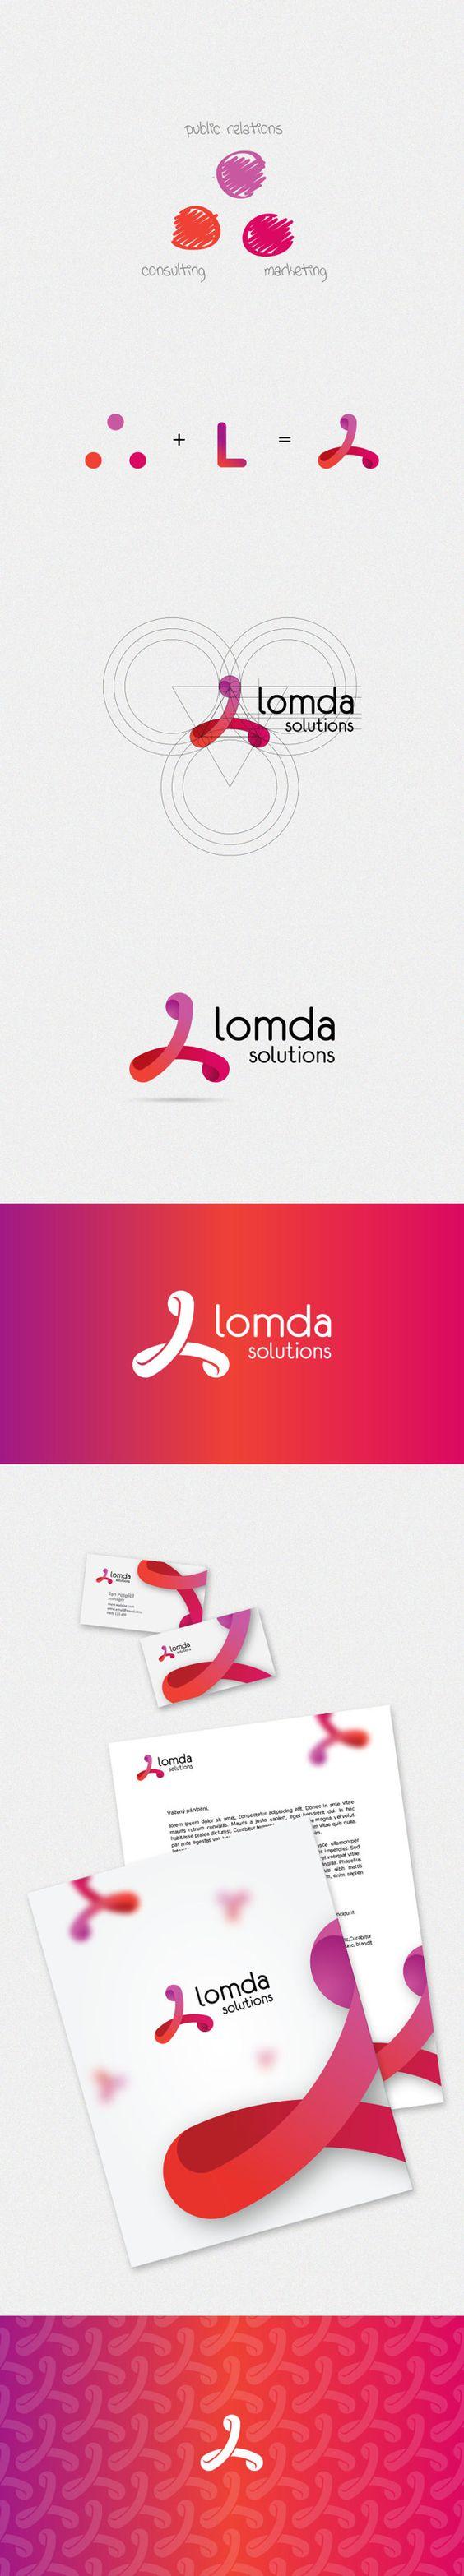 lomda Logo Design on Pinterest Creative, Logo design